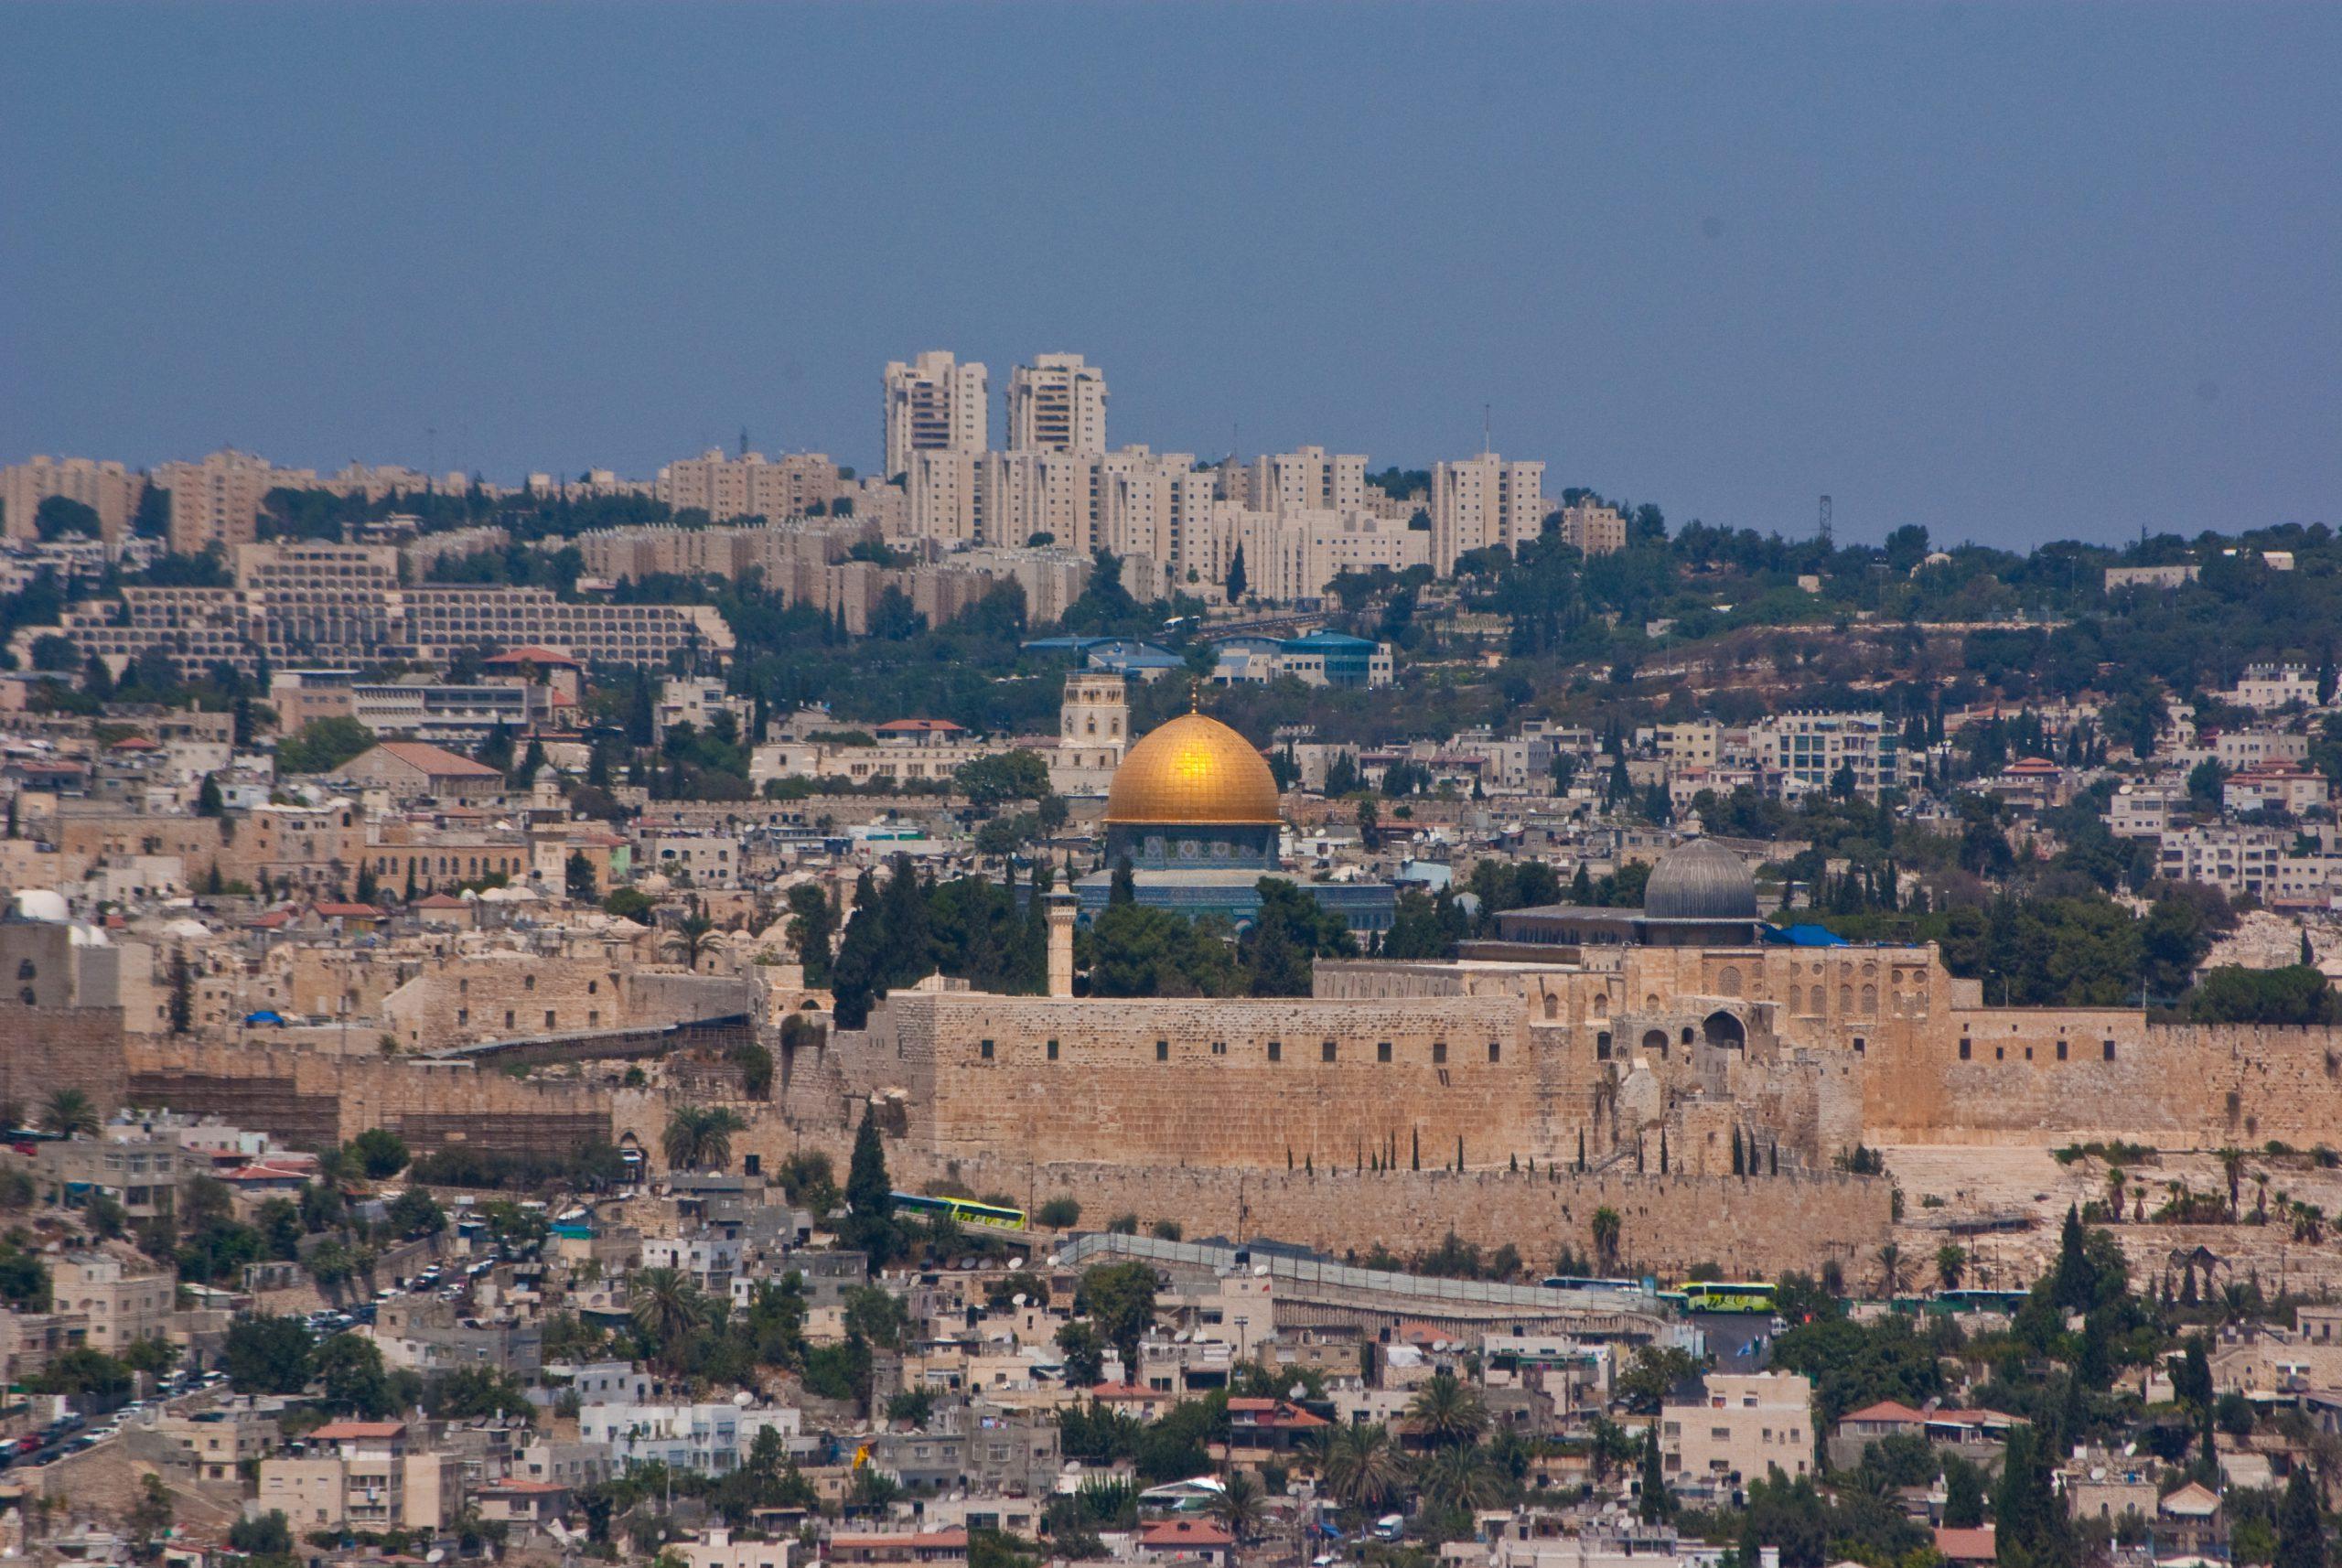 Palestinians Resent the Status Quo